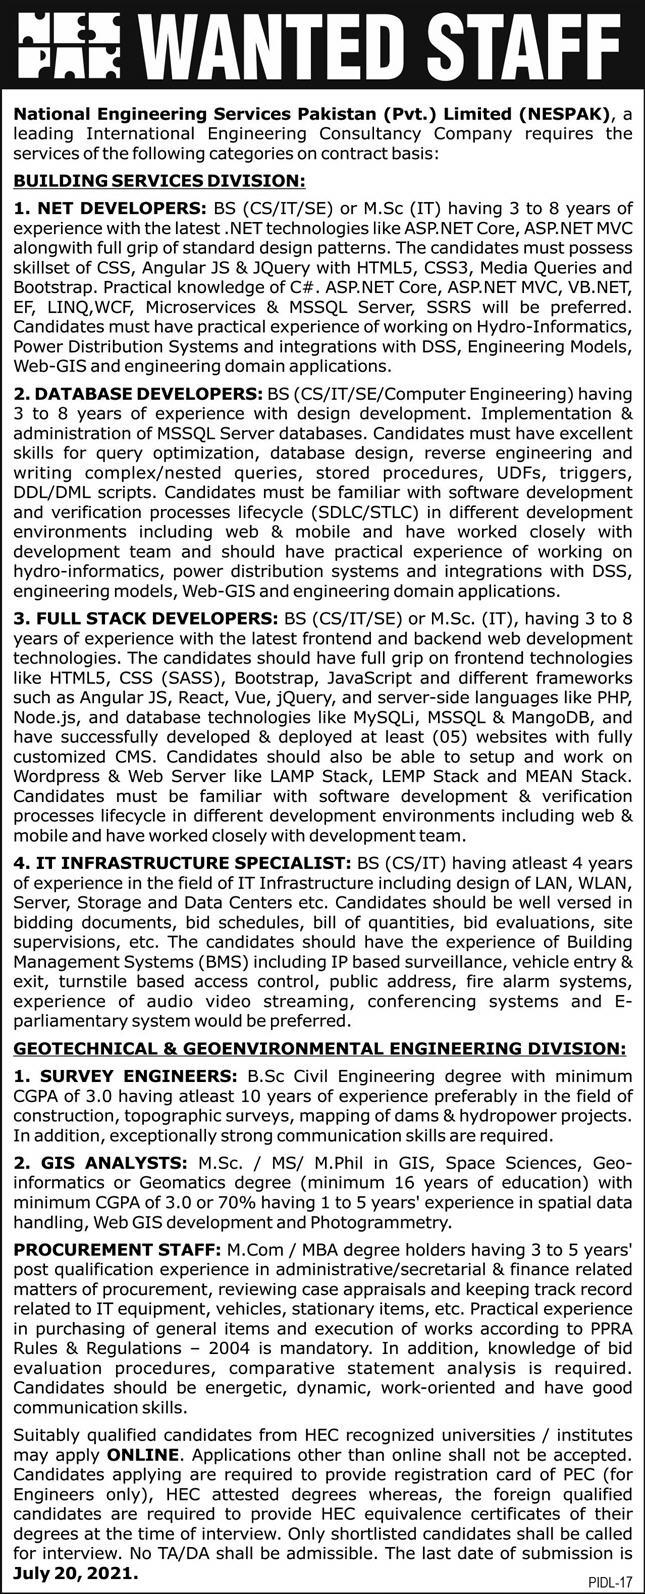 National Engineering Services Pakistan NESPAK Jobs 2021 In Lahore